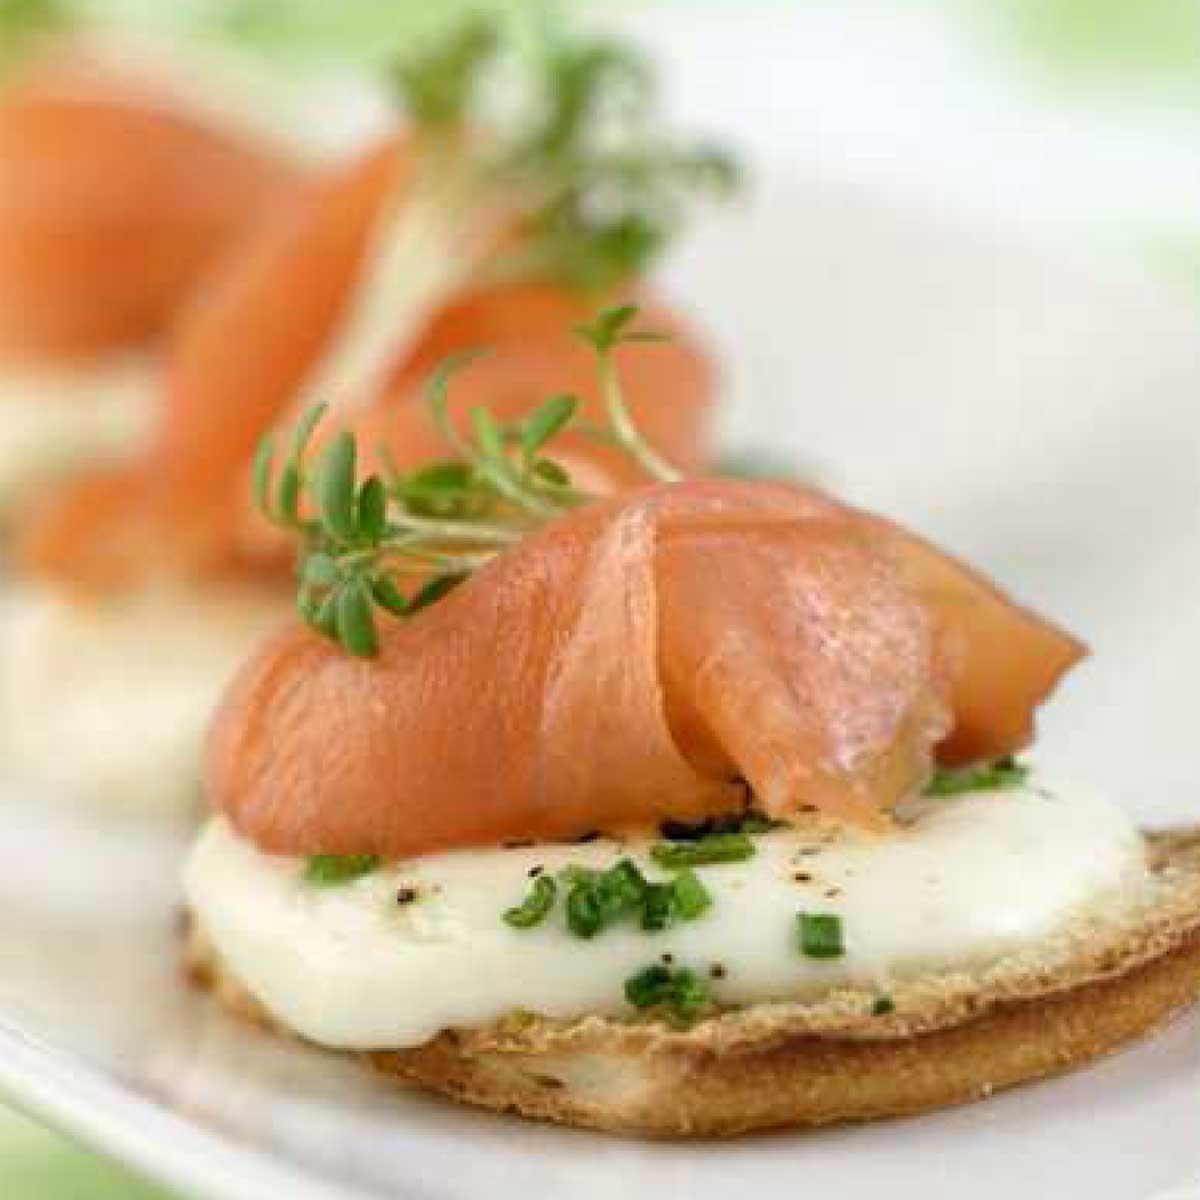 recette toasts de saumon fum la mozzarella cuisine madame figaro. Black Bedroom Furniture Sets. Home Design Ideas